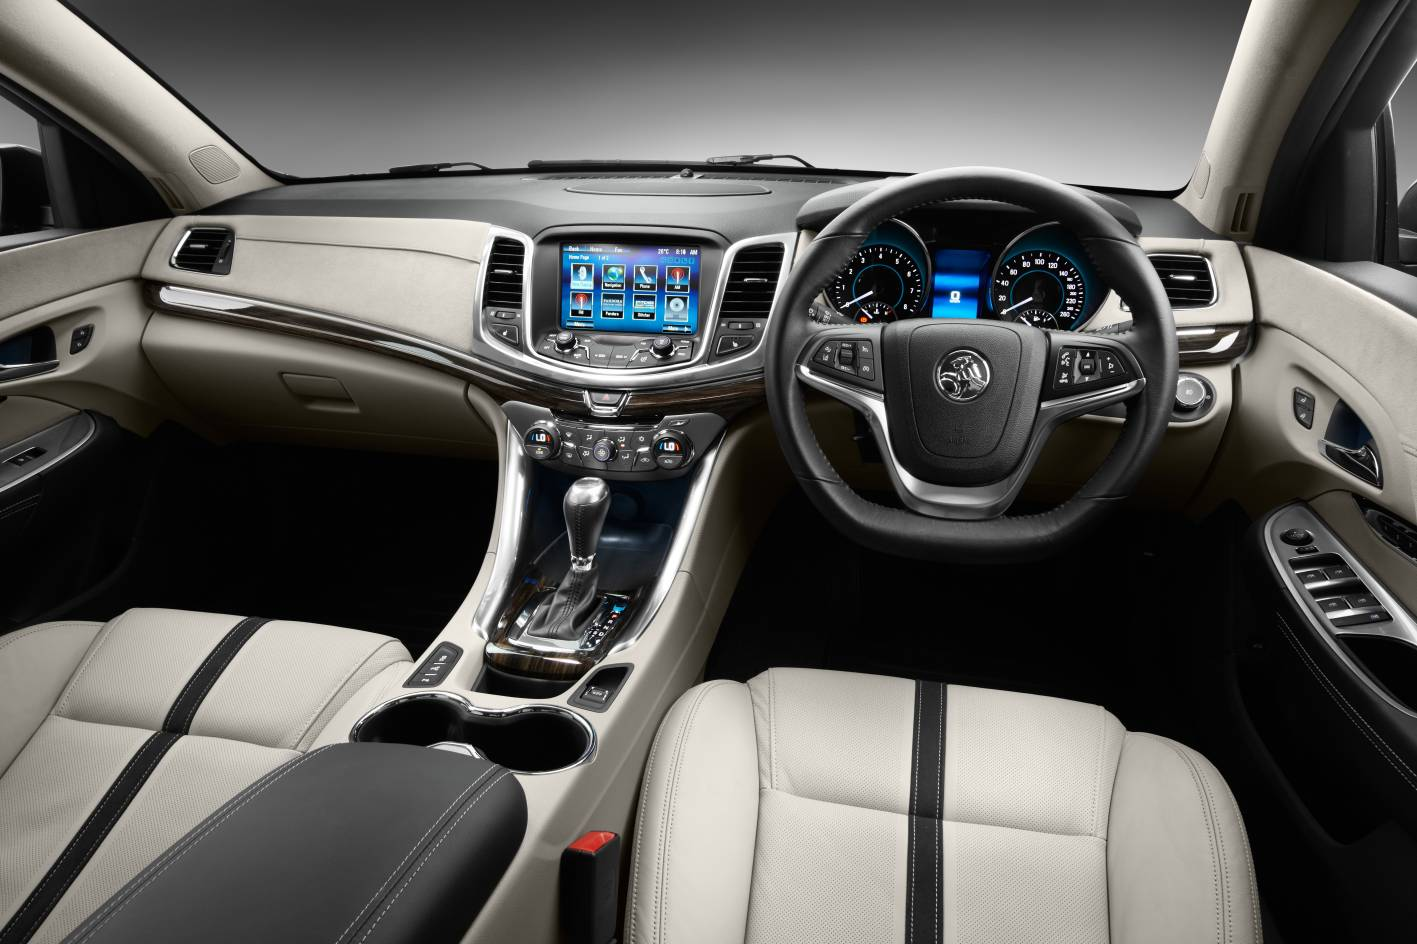 2013 Holden Vf Commodore Chevrolet Ss Breaks Cover